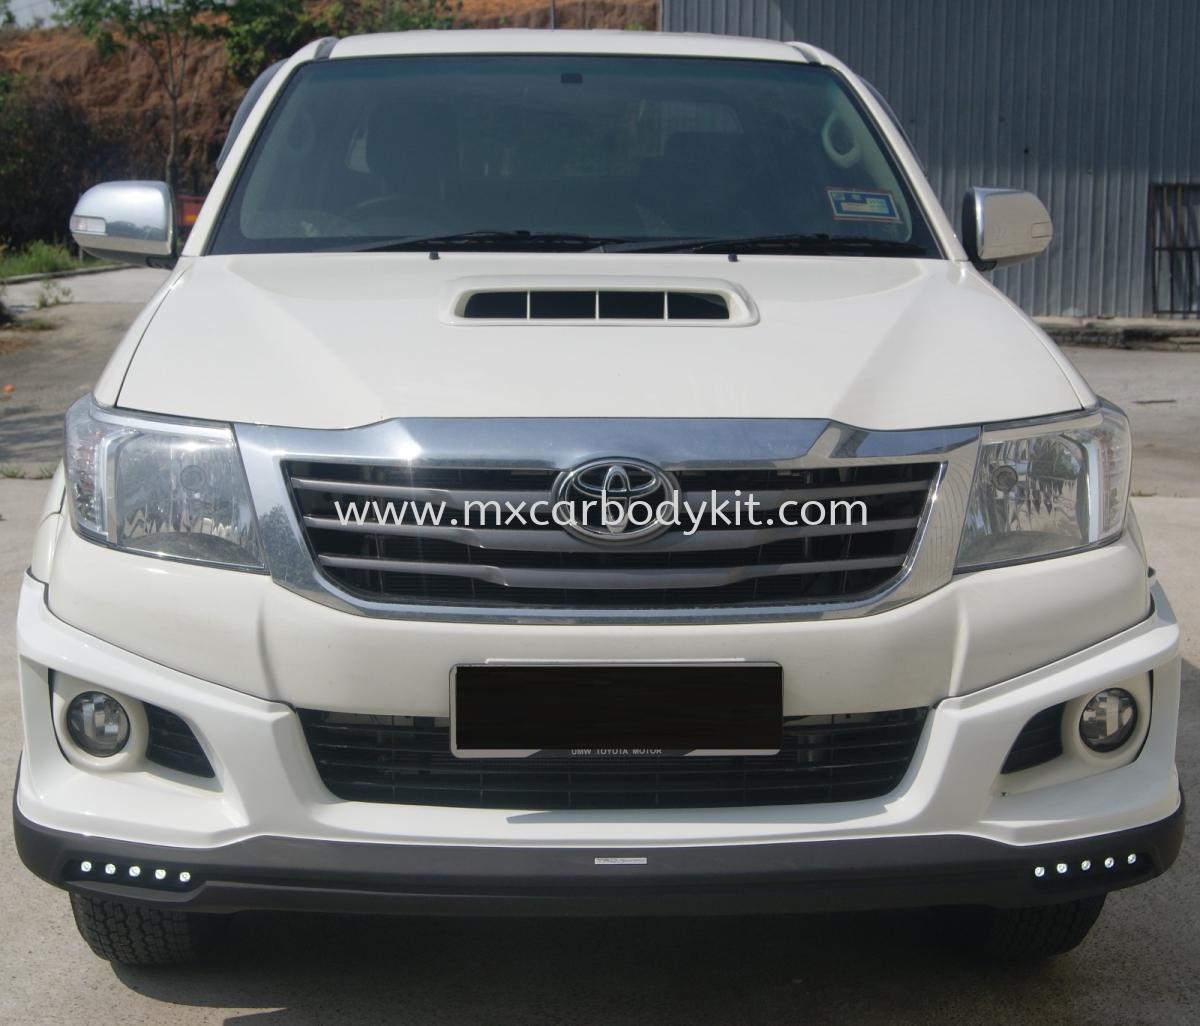 TOYOTA HILUX VIGO SPORTIVO BODYKIT + SPOILER HILUX 2011 - 2015  TOYOTA Johor, Malaysia, Johor Bahru (JB), Masai. Supplier, Suppliers, Supply, Supplies | MX Car Body Kit